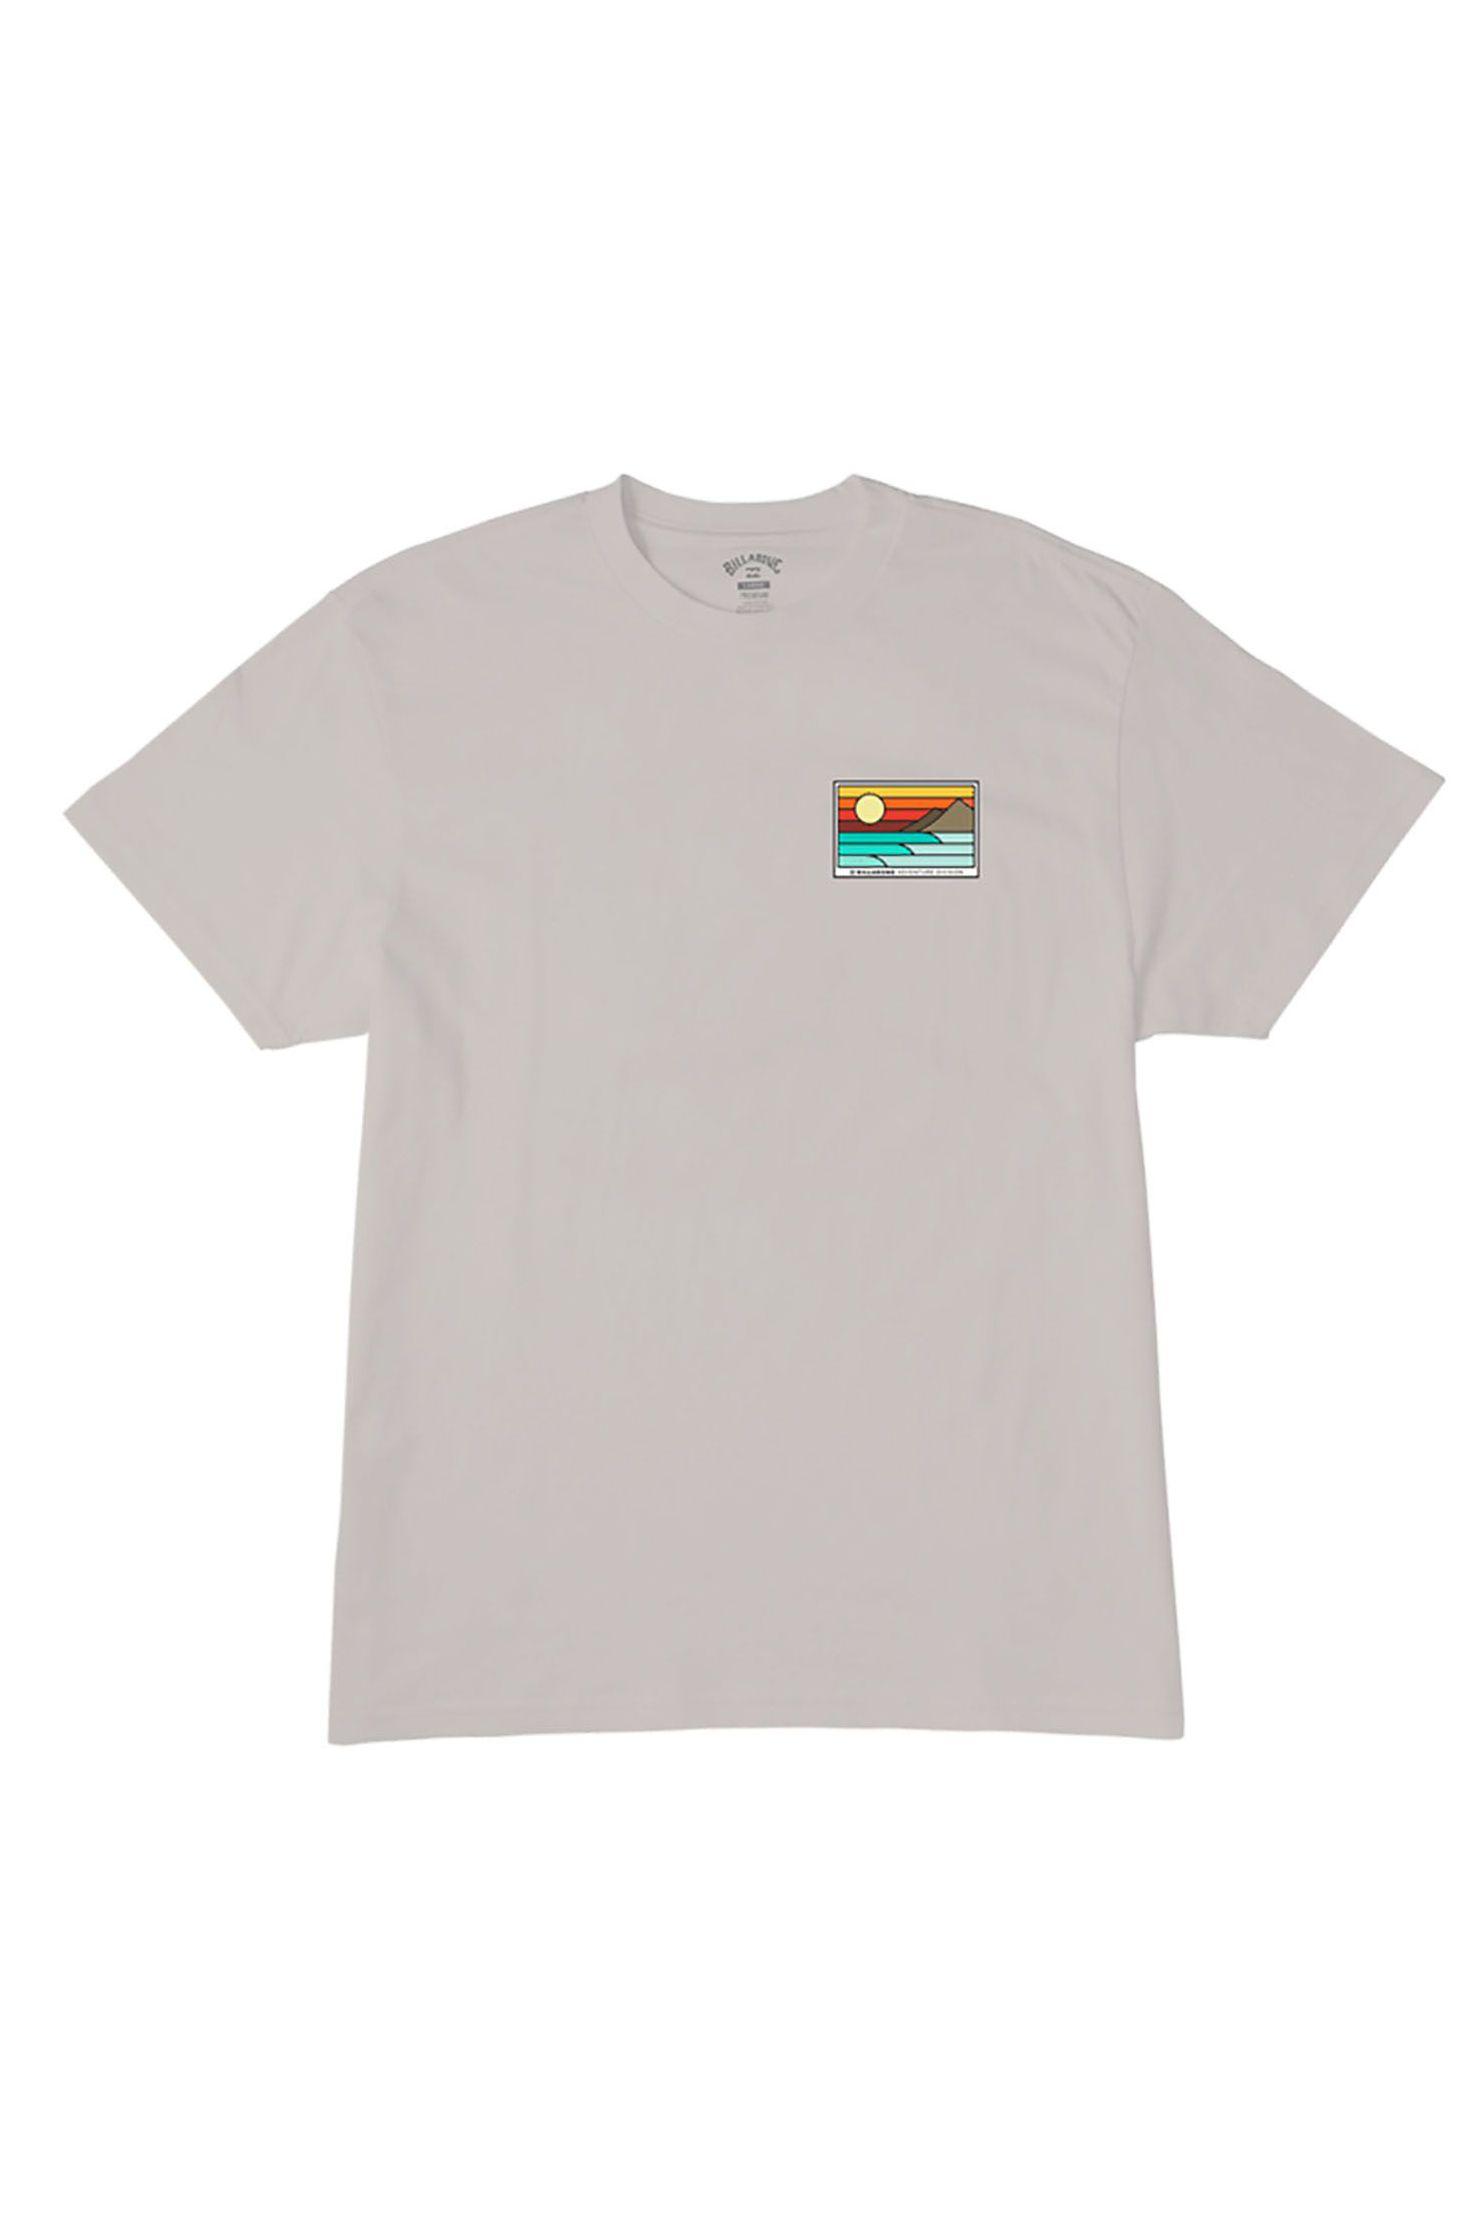 Billabong T-Shirt PROSPECT SS ADVENTURE DIVISION Chino